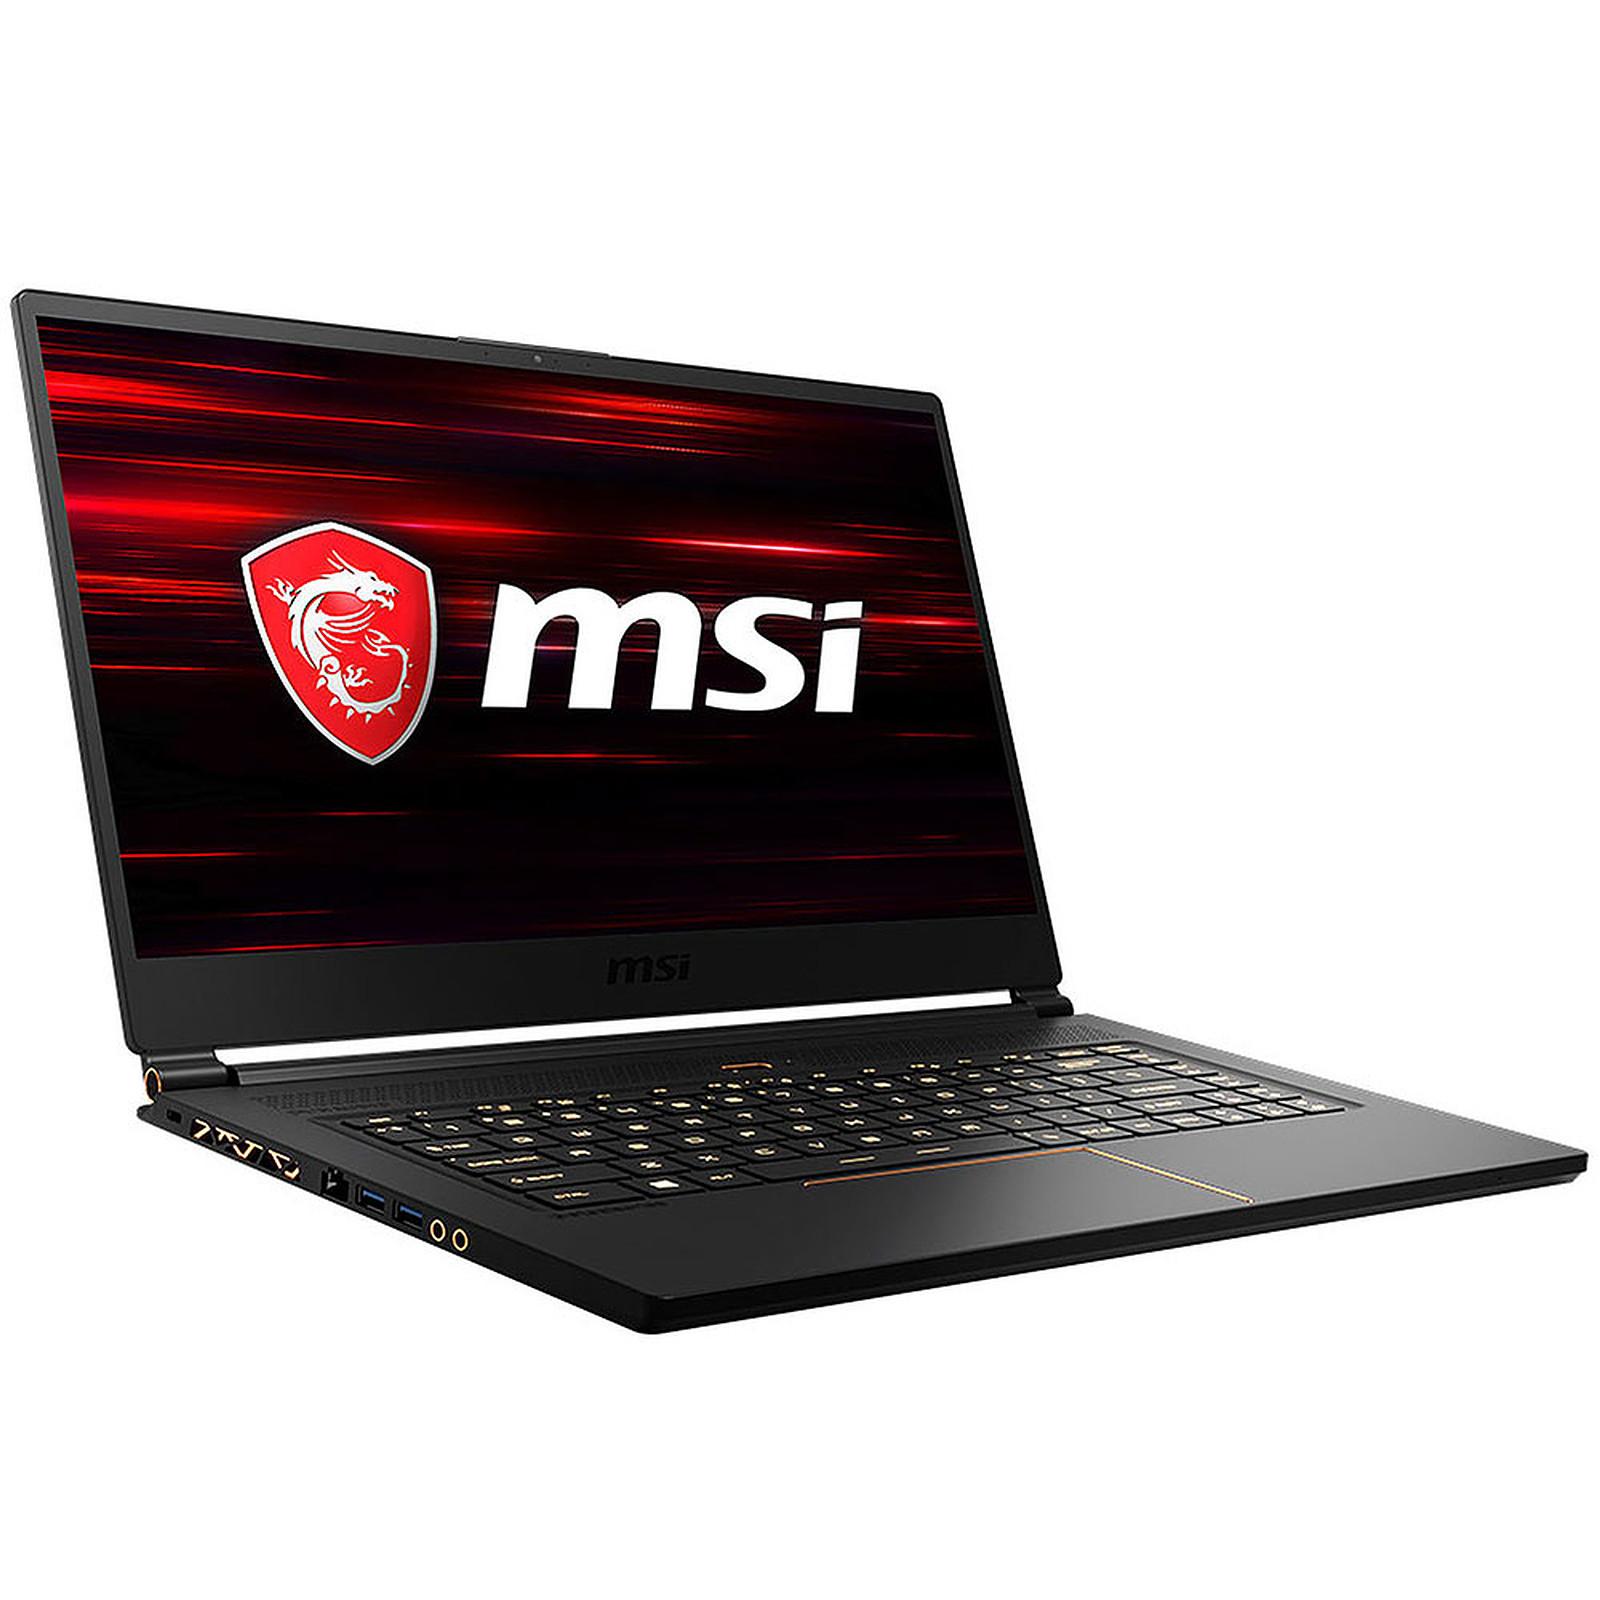 "PC ultraportable gaming 15.6"" MSI GS65 Stealth 9SF-1671FR - Full HD IPS 144 Hz, i7-9750H, RAM 32 Go, SSD 512 Go, RTX 2070 (1.8 cm / 1.9 kg)"